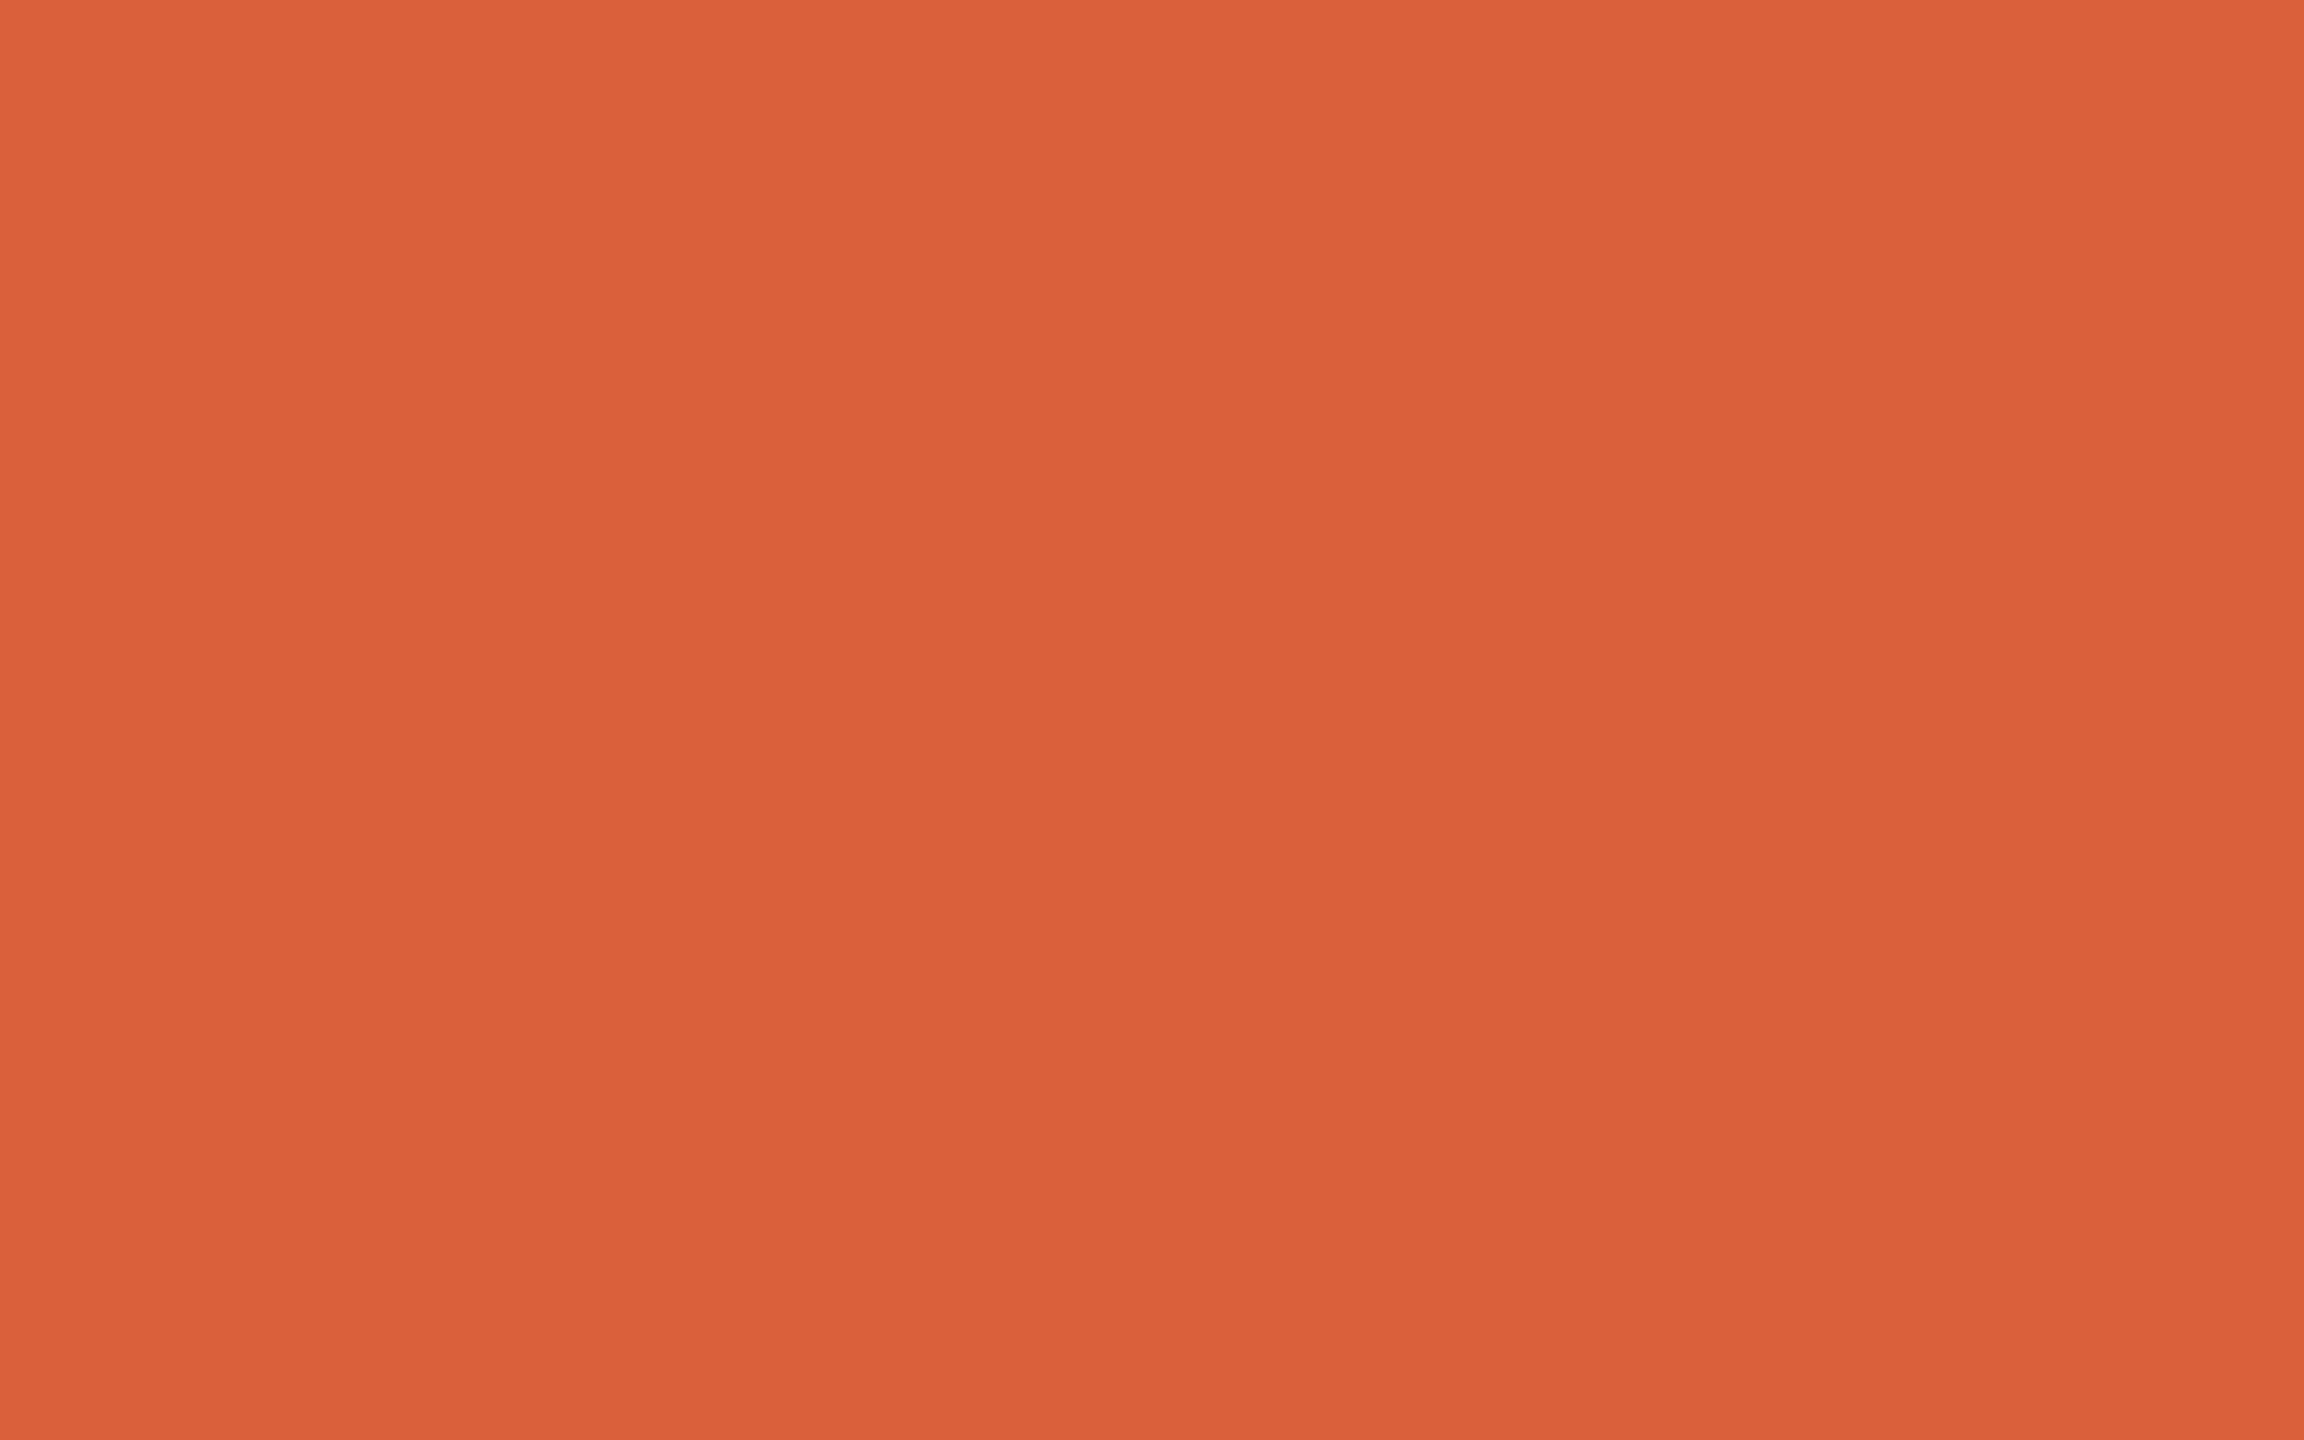 2304x1440 Medium Vermilion Solid Color Background